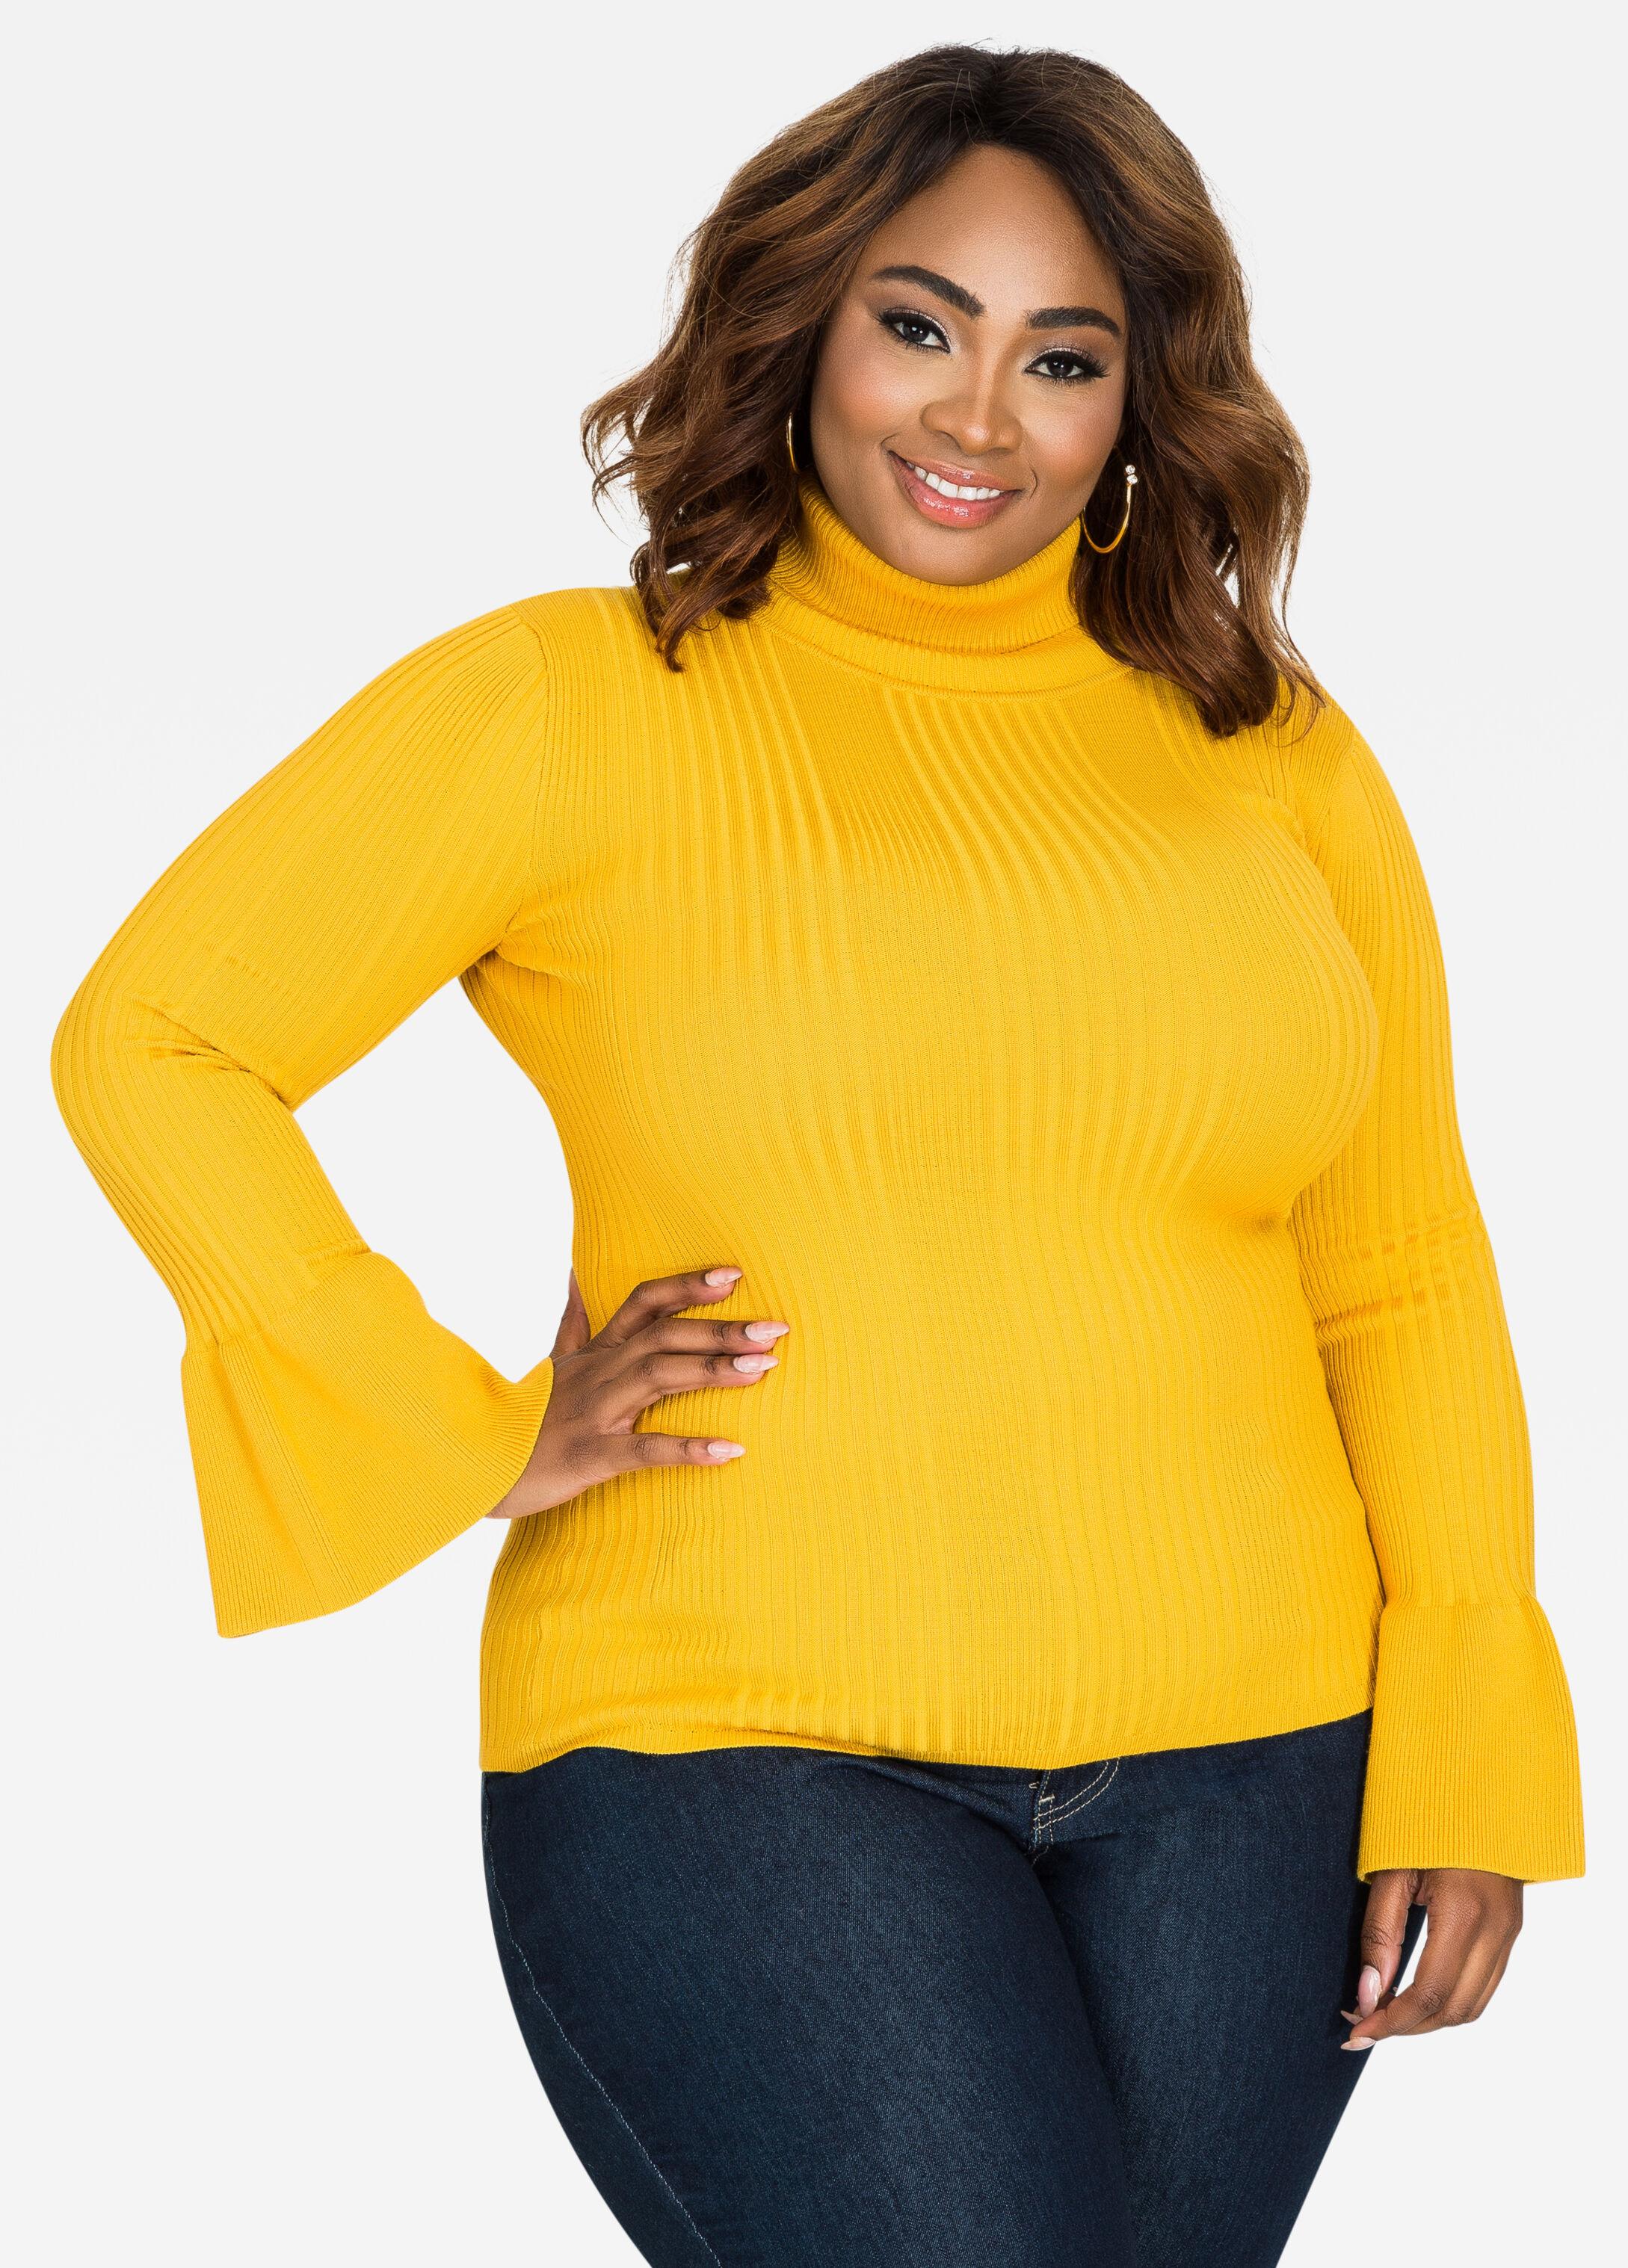 Plus Size Sweaters - Turtleneck sweater